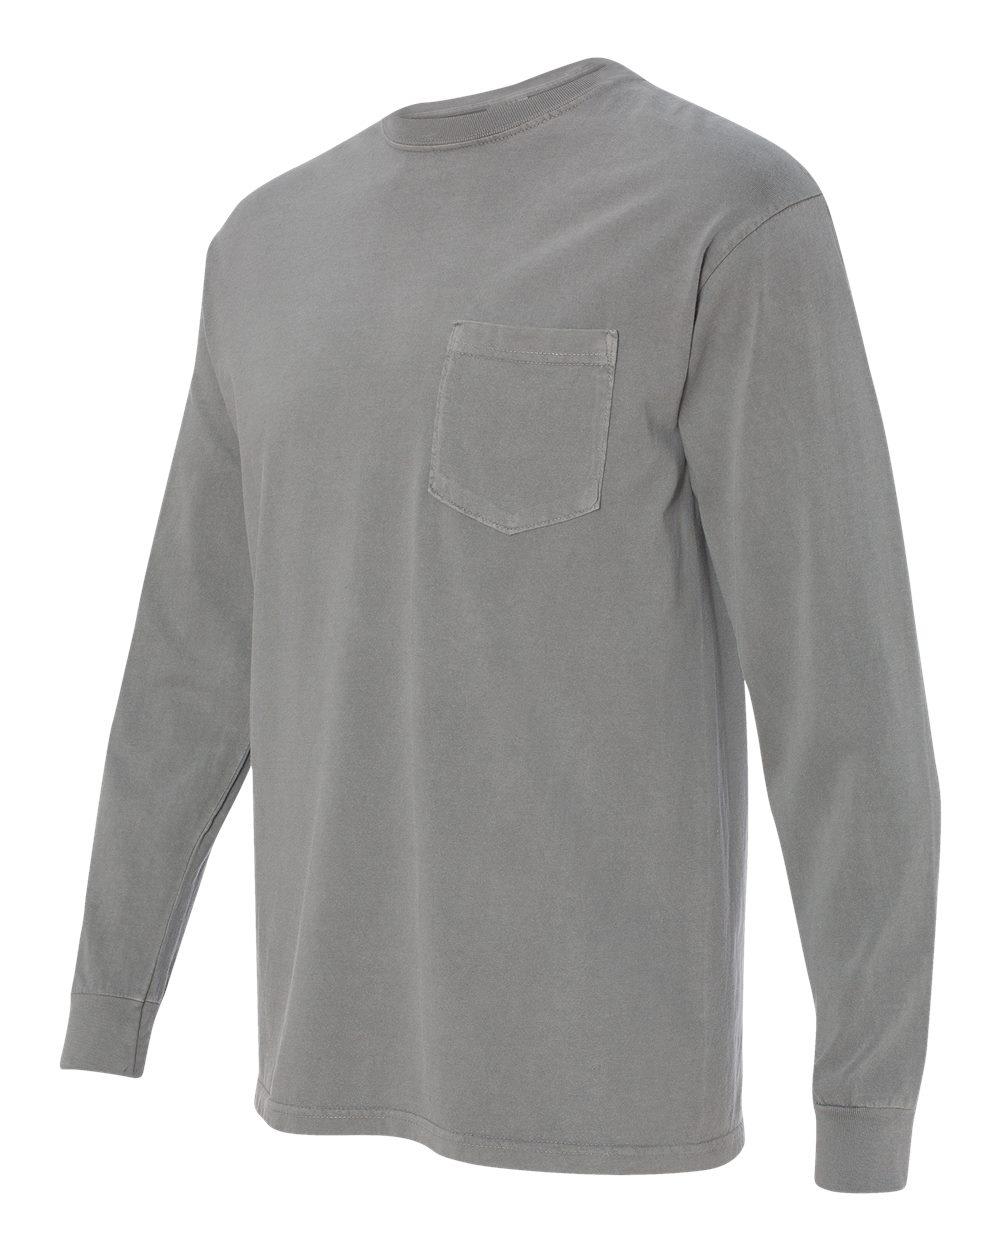 Comfort-Colors-Men-039-s-6-1-oz-Long-Sleeve-Pocket-T-Shirt-C4410-S-3XL thumbnail 17